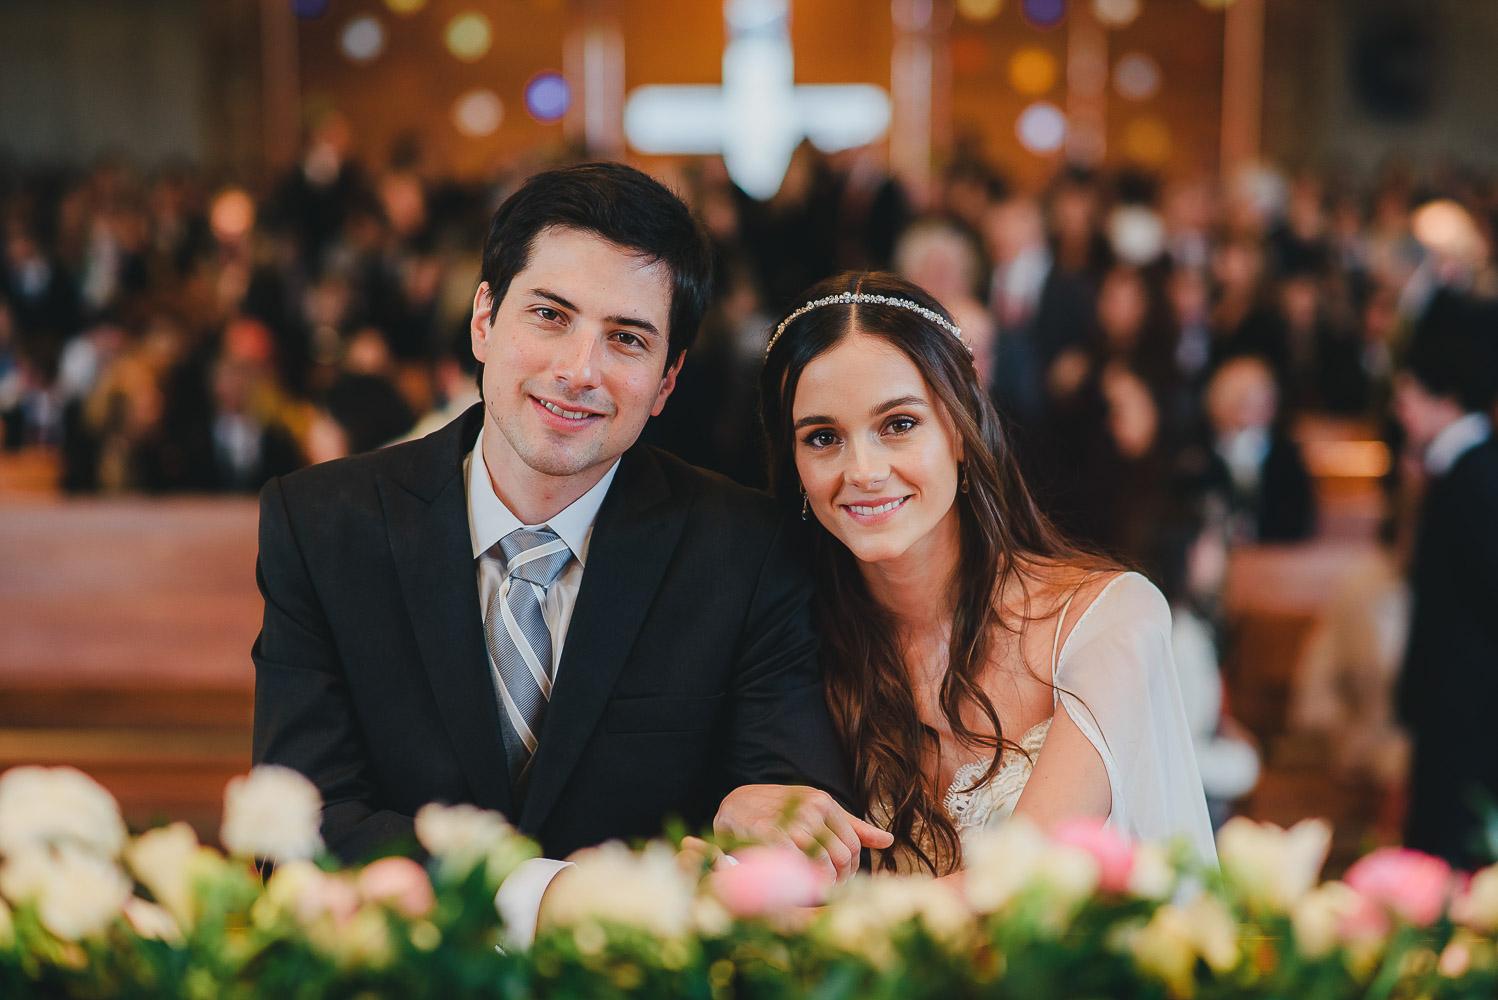 matrimonio-carampangue-58.jpg